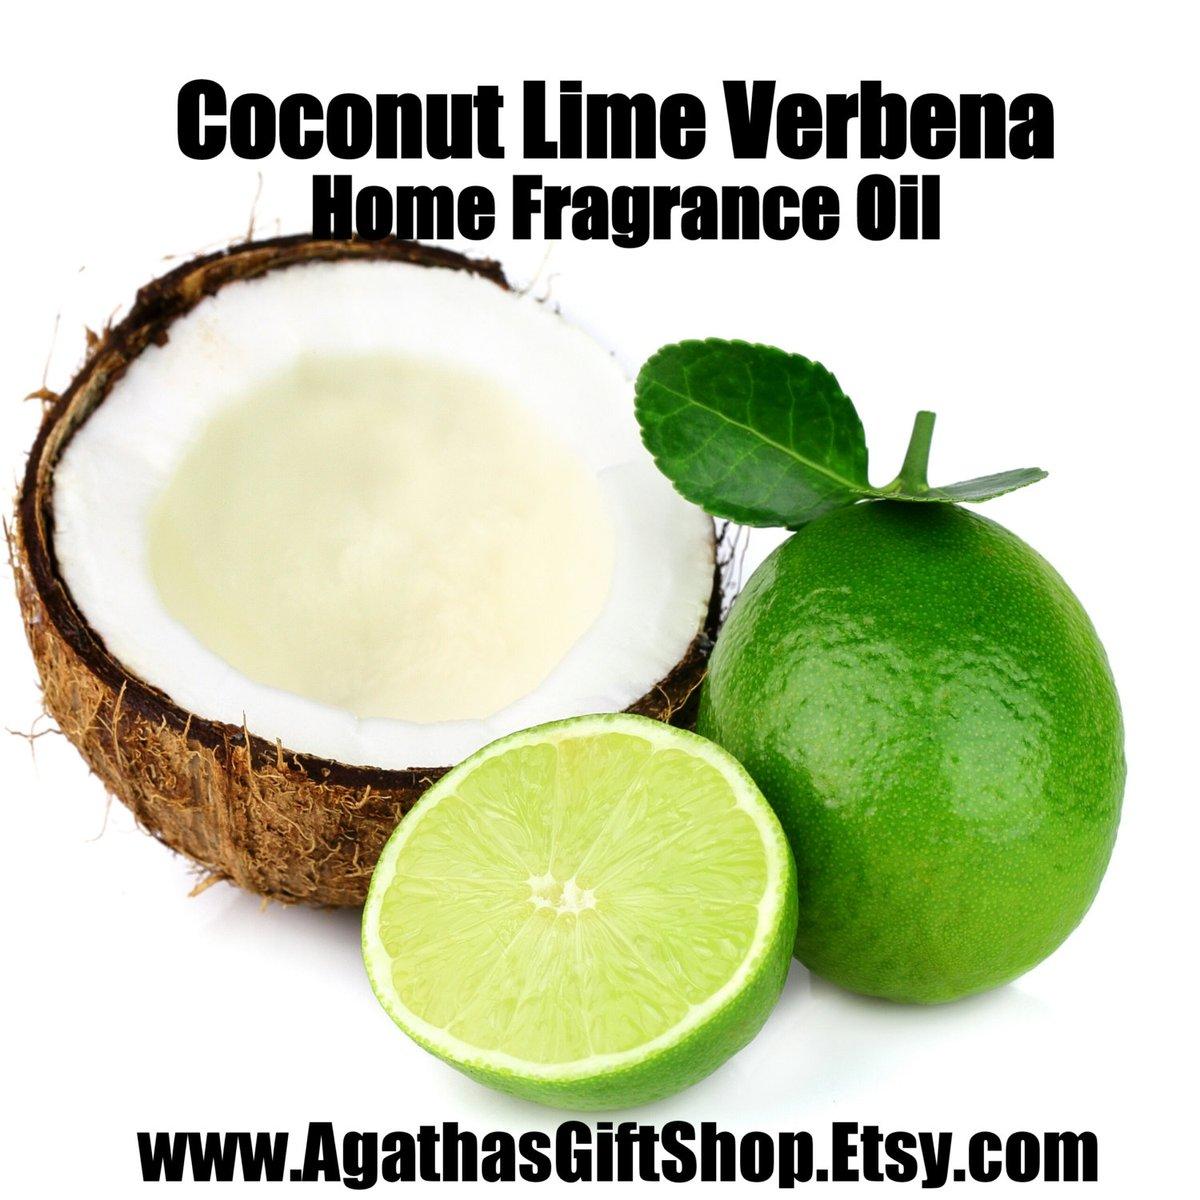 Coconut Lime Verbena (Type) Home Fragrance Diffuser Warmer Aromatherapy Burning Oil  #BlackFriday #GiftShopSale #HerbalRemedies #Etsy #AromatherapyOil #CyberMonday #PerfumeBodyOils #HomeFragranceOil #Incense #HomeDecor